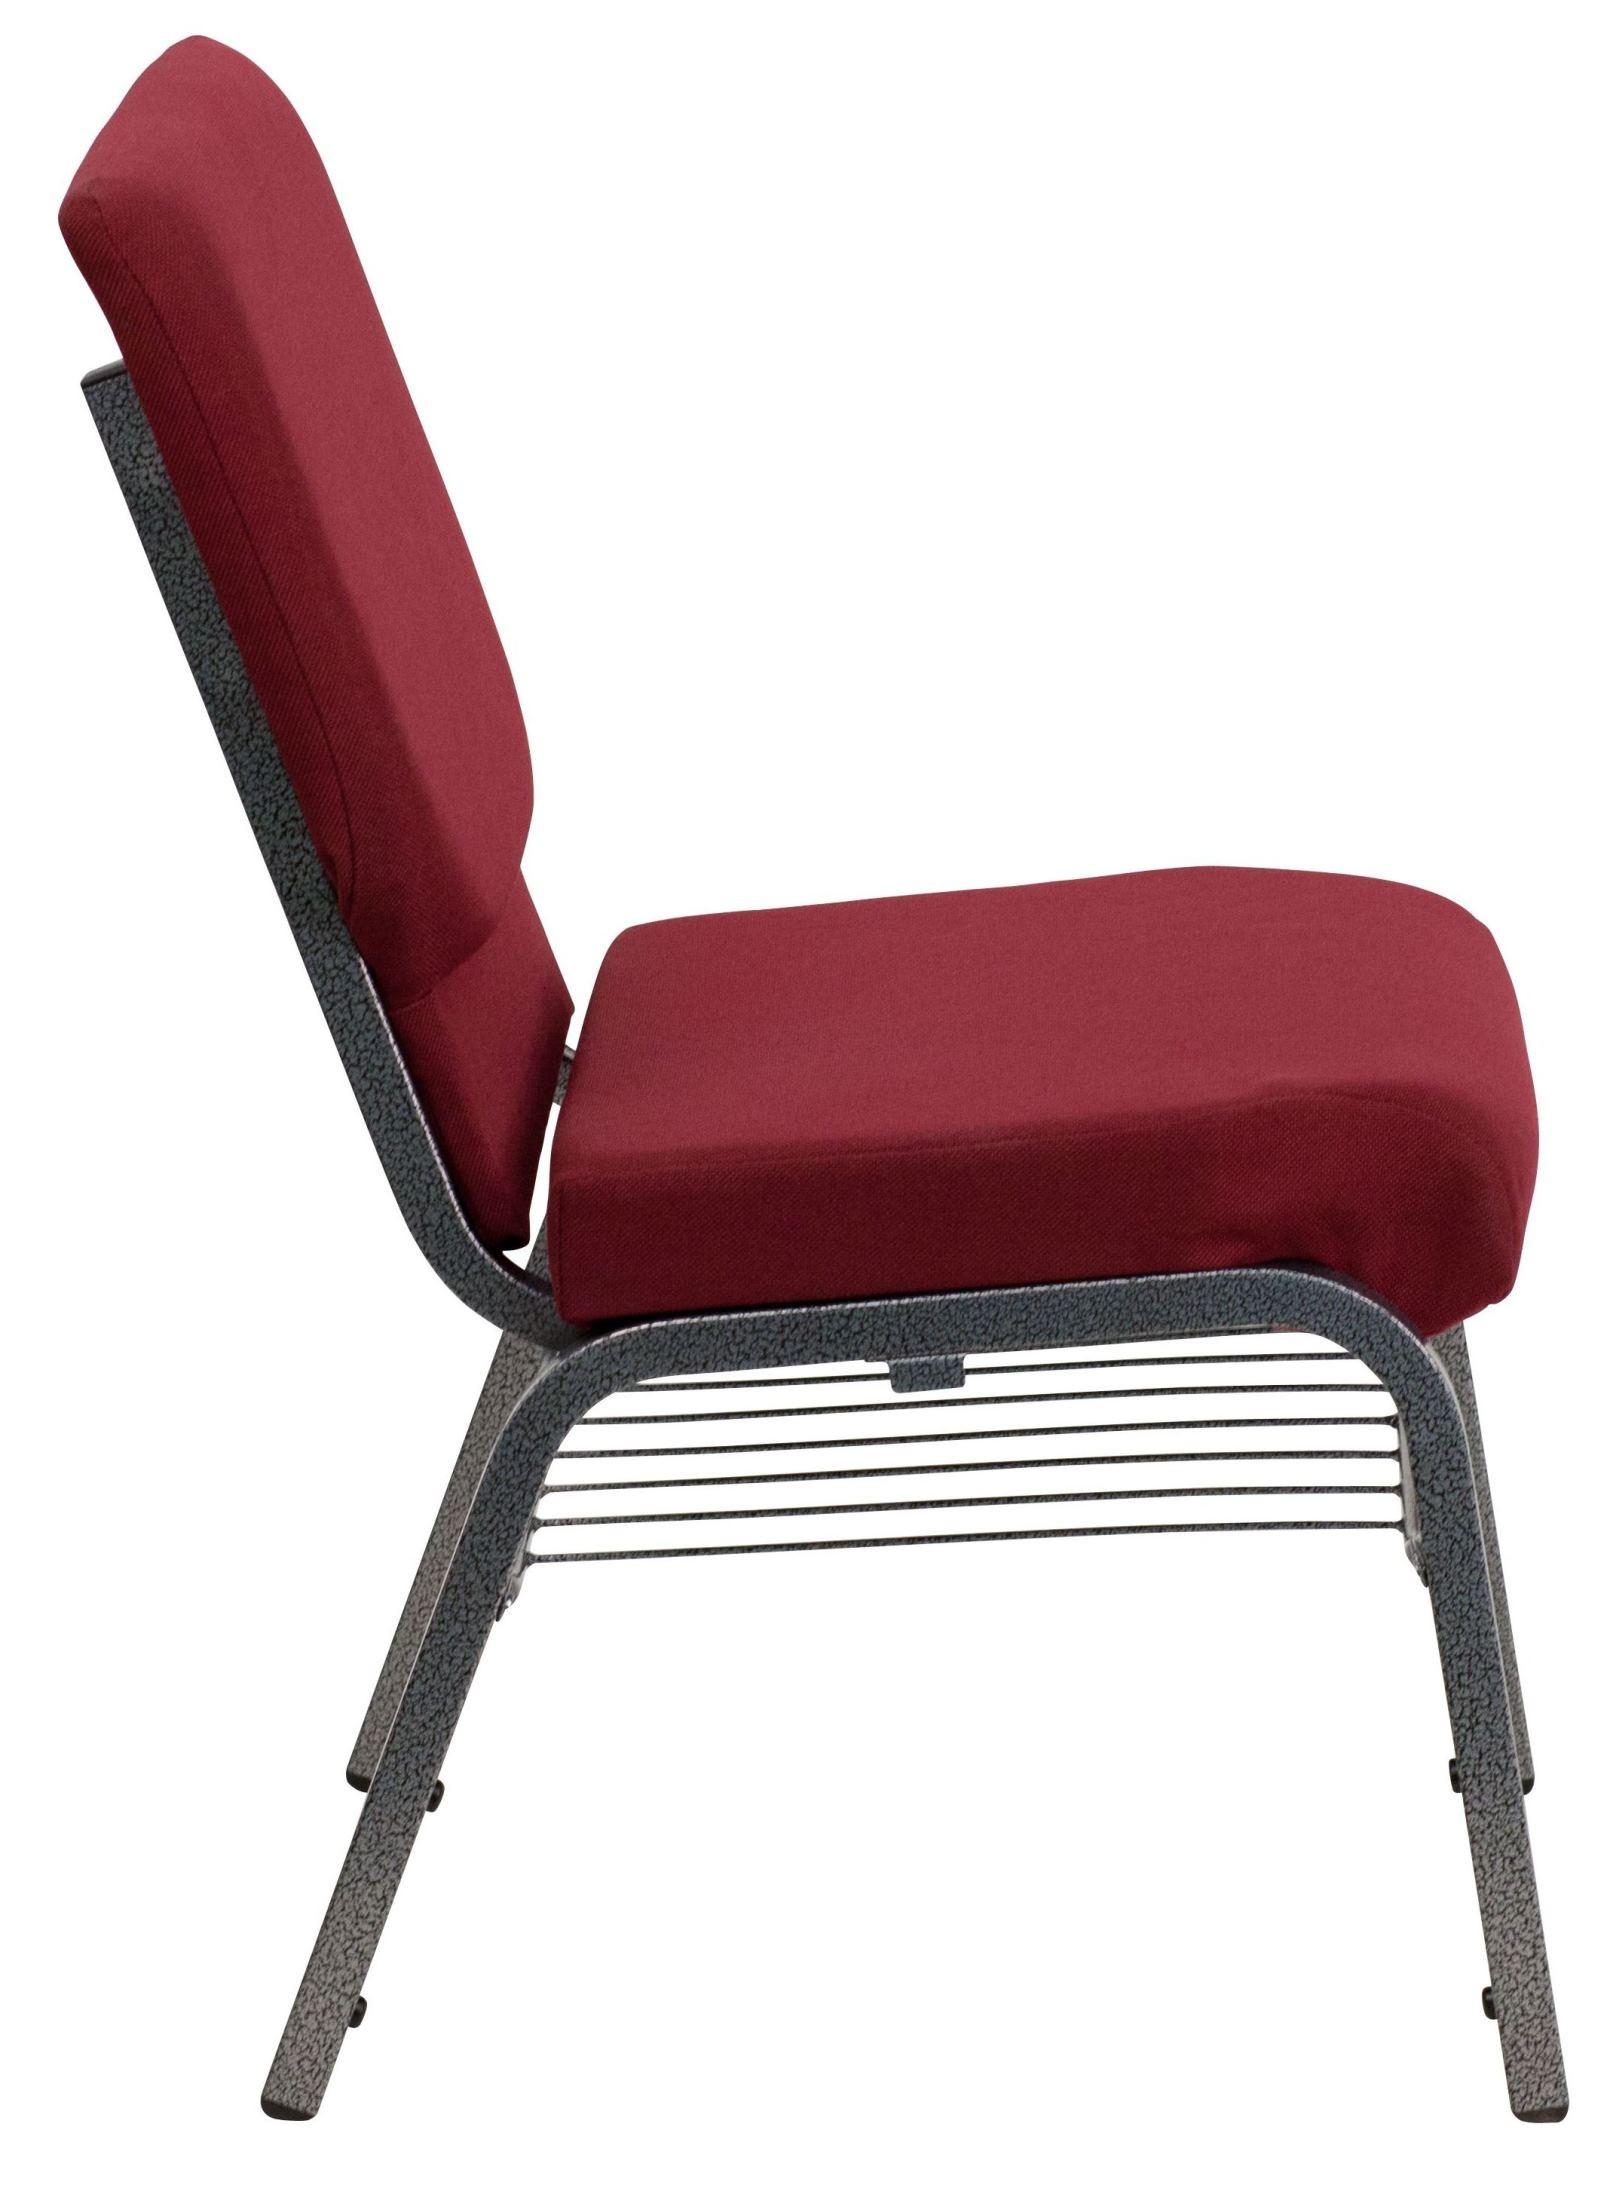 Hercules Series Burgundy Fabric Church Chair From Renegade Coleman Furniture